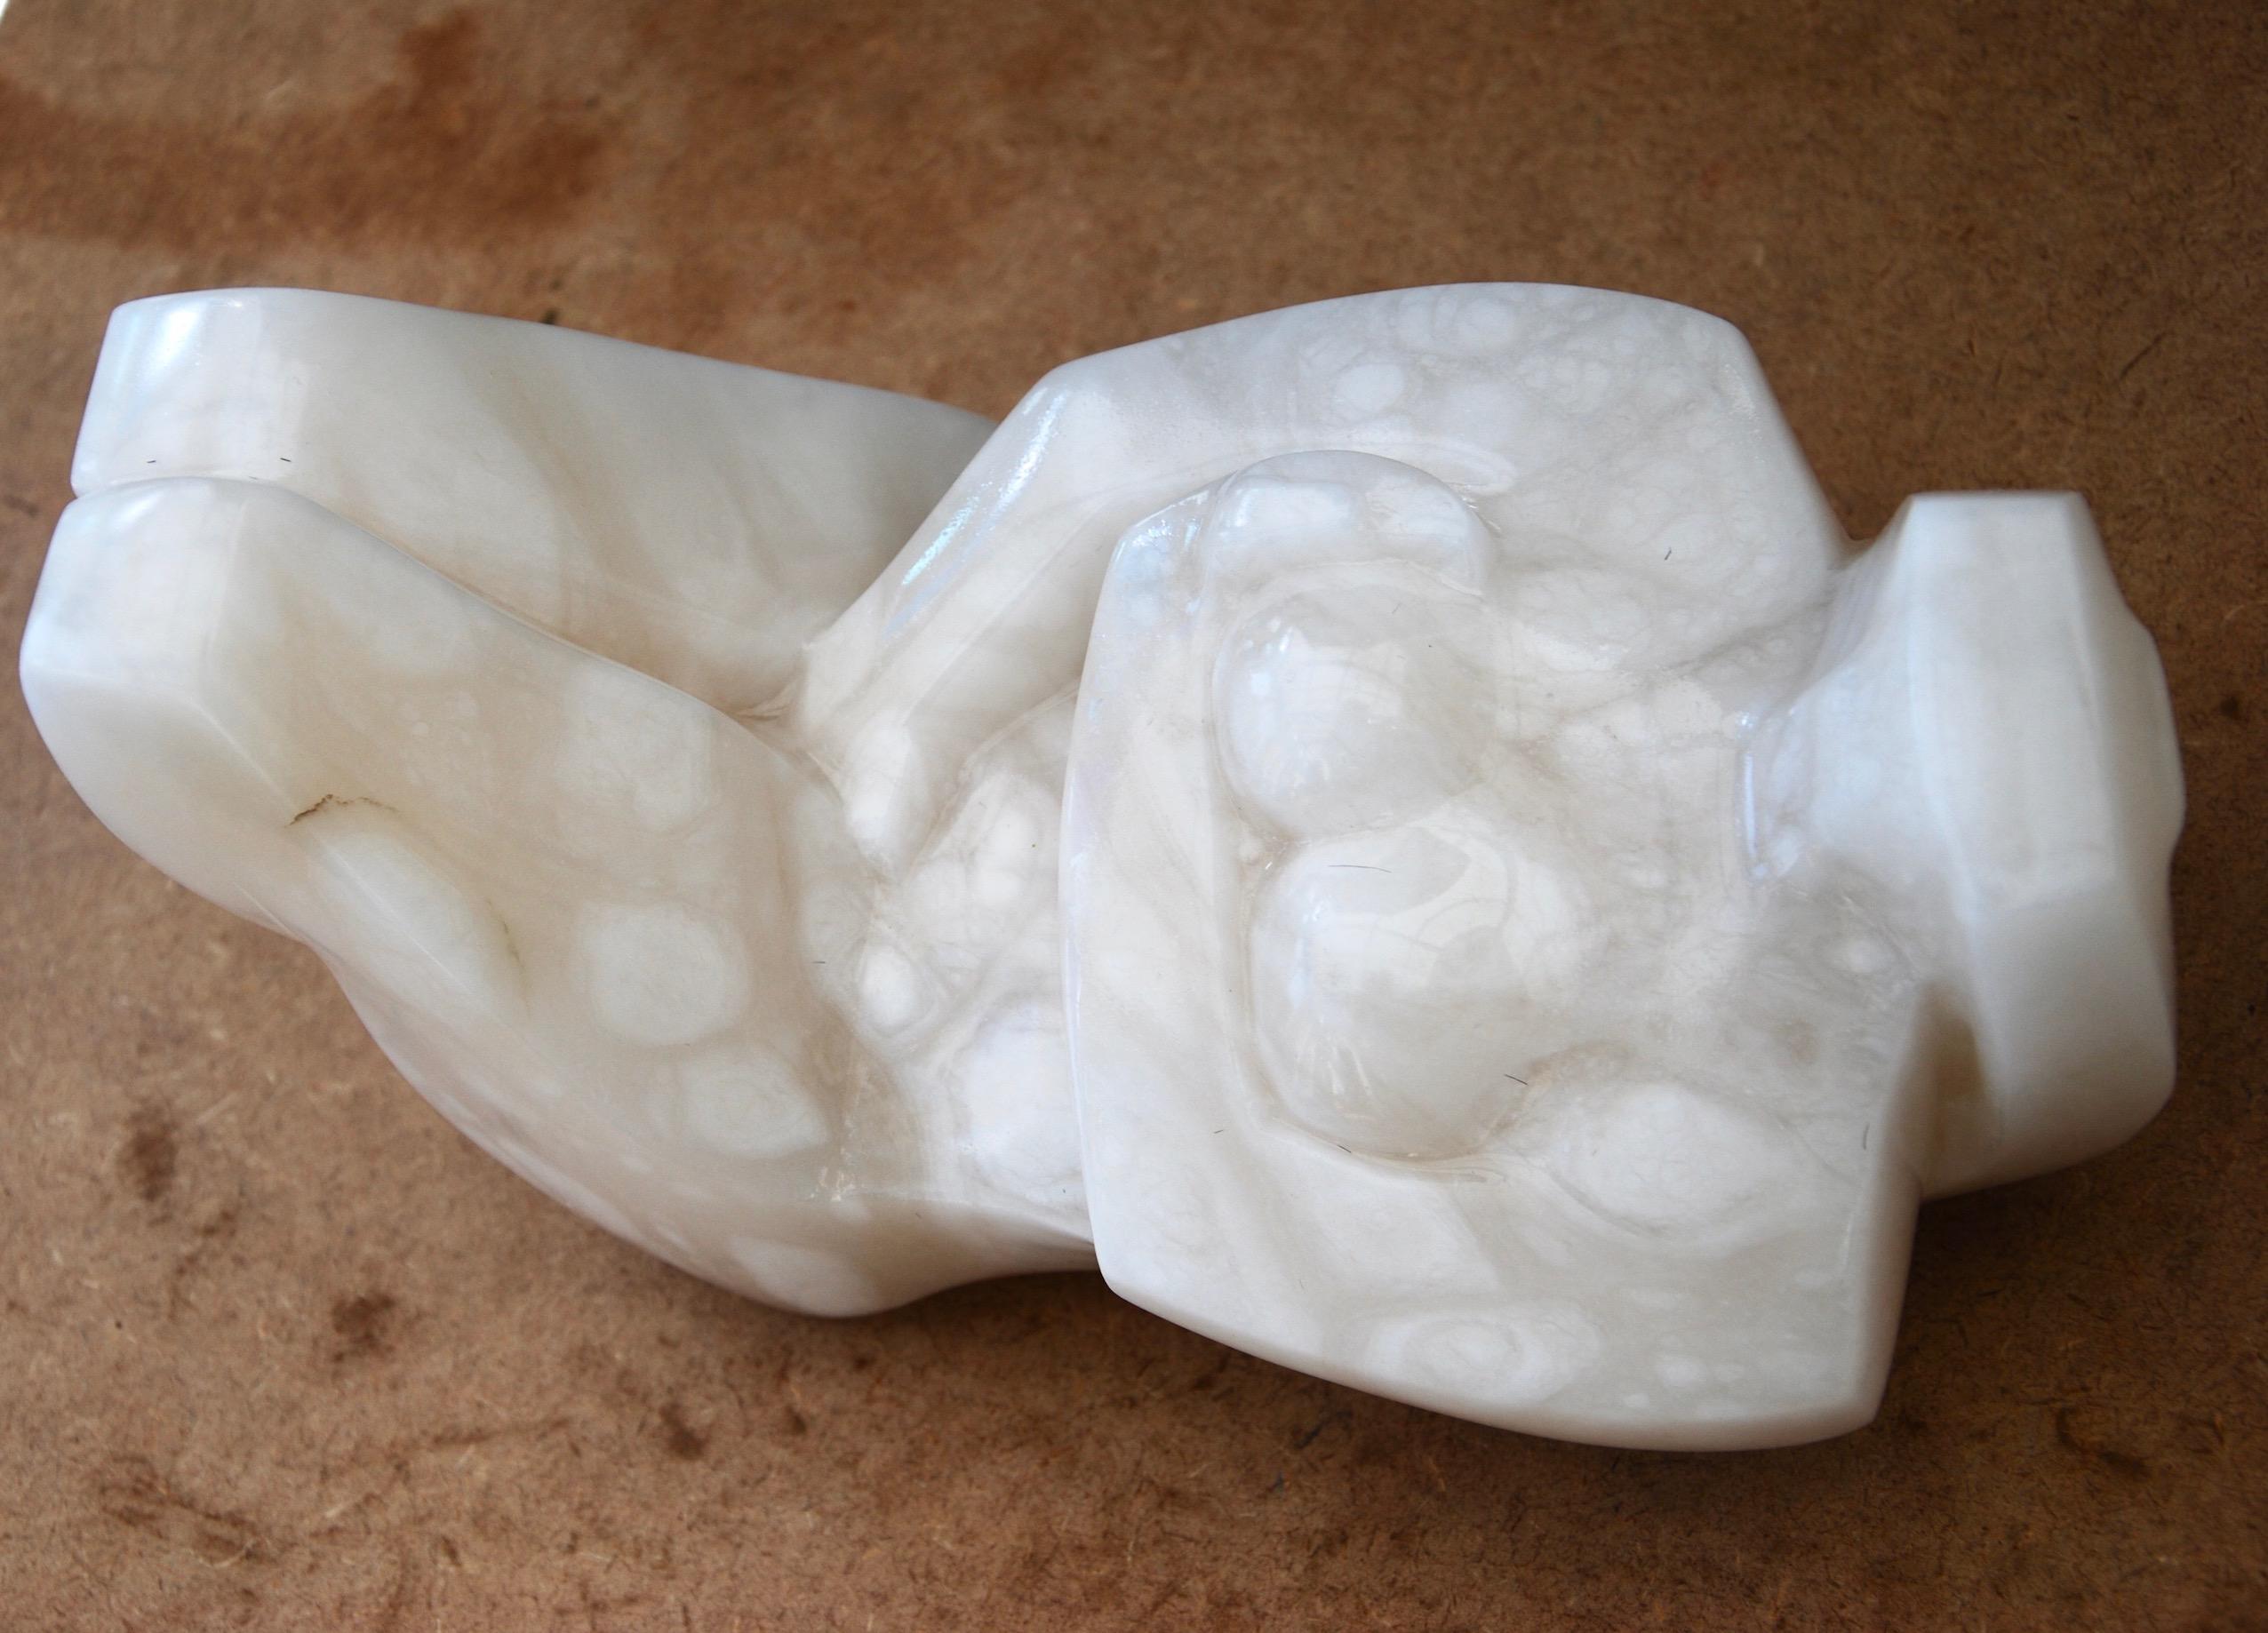 Cycladic figure, dreaming